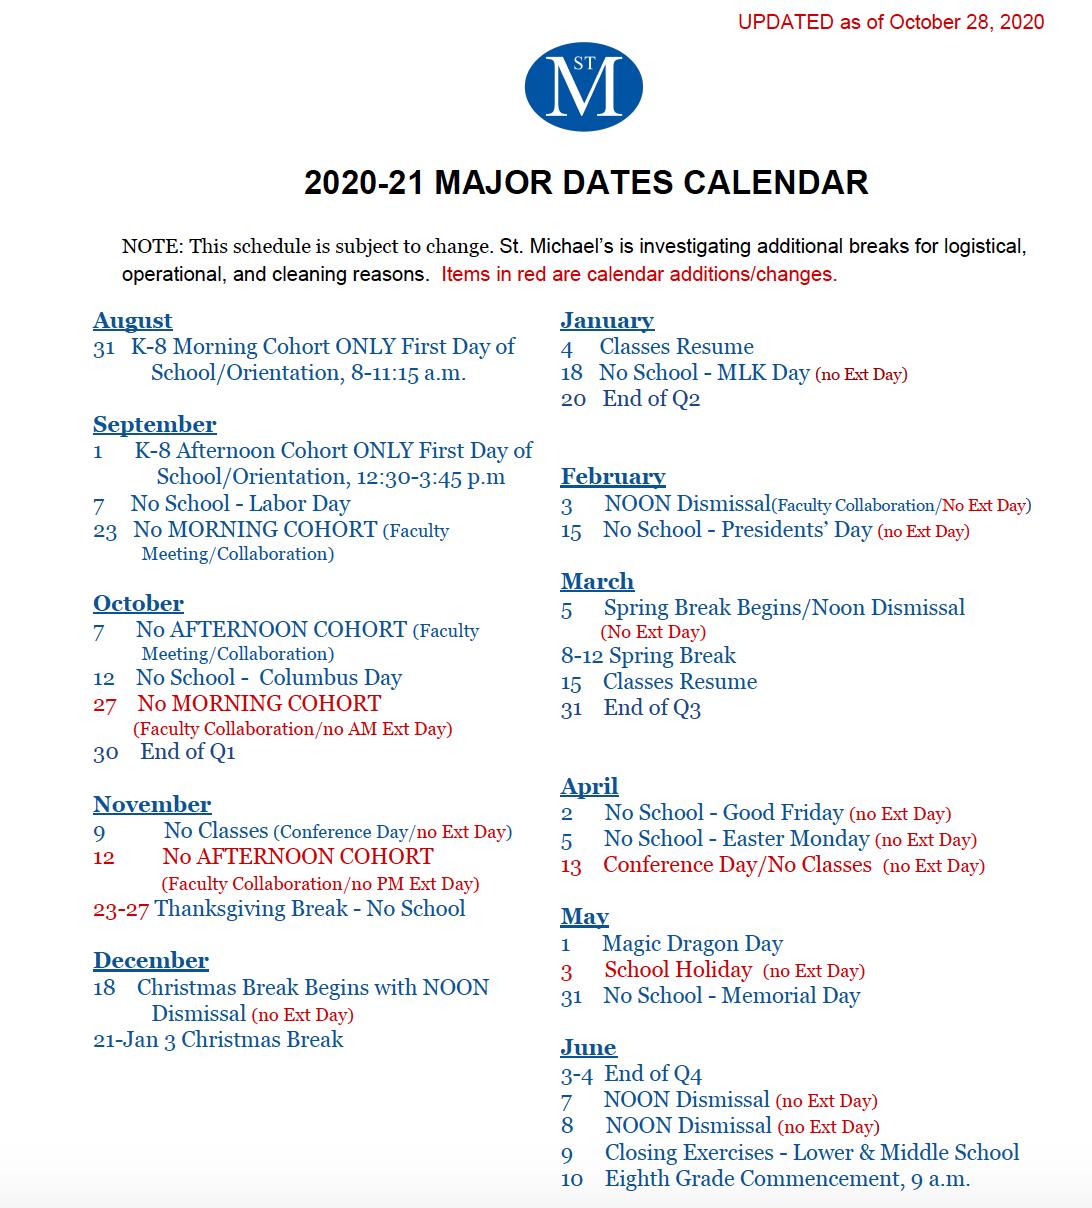 Vcu Spring 2022 Calendar.2020 2021 Key Dates Schedules News Events St Michael S Episcopal School